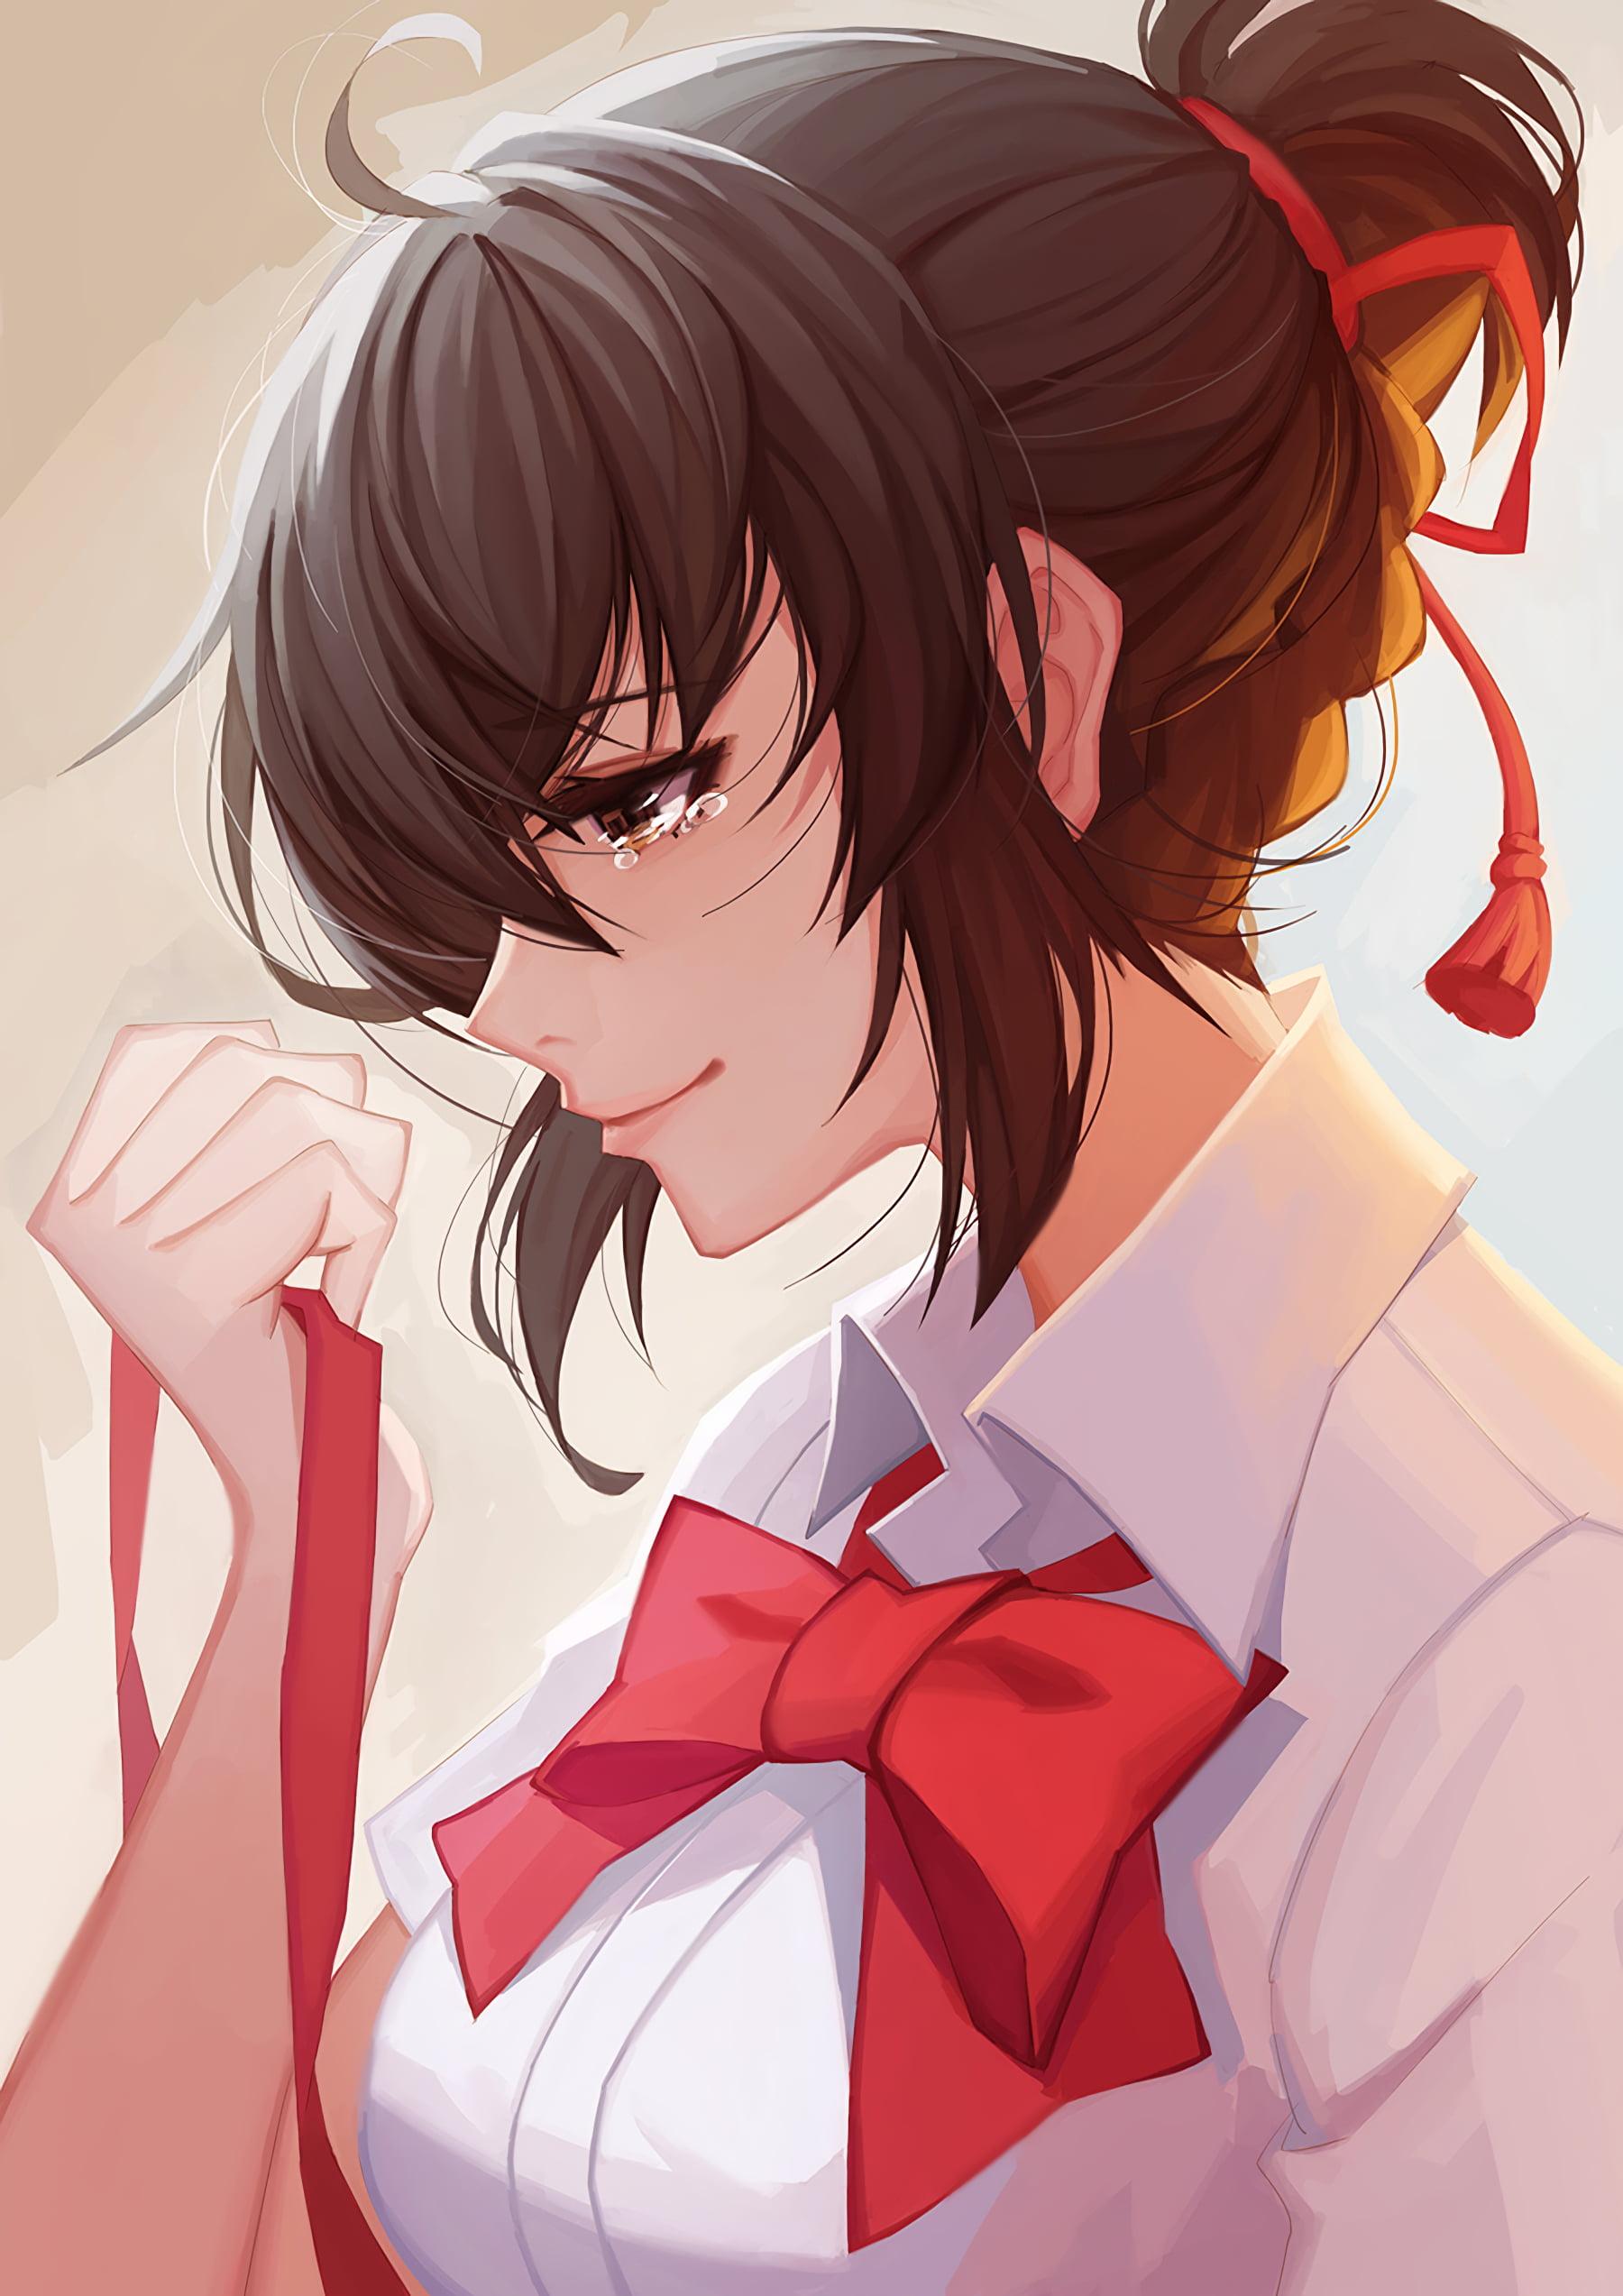 anime woman wearing white